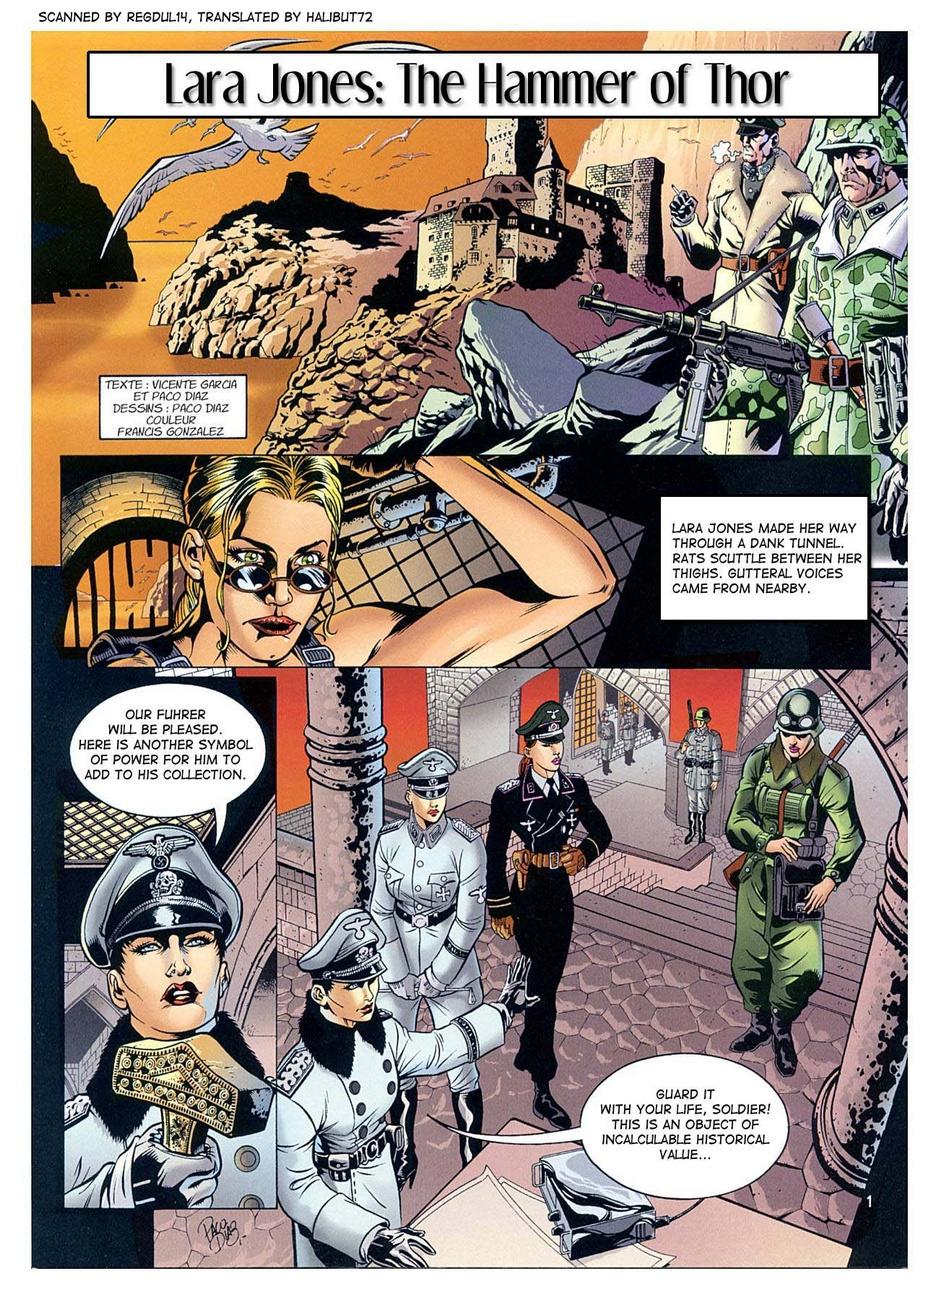 Little Thor Porn - toon adventures porn comics xxx 2 - MegaPornX